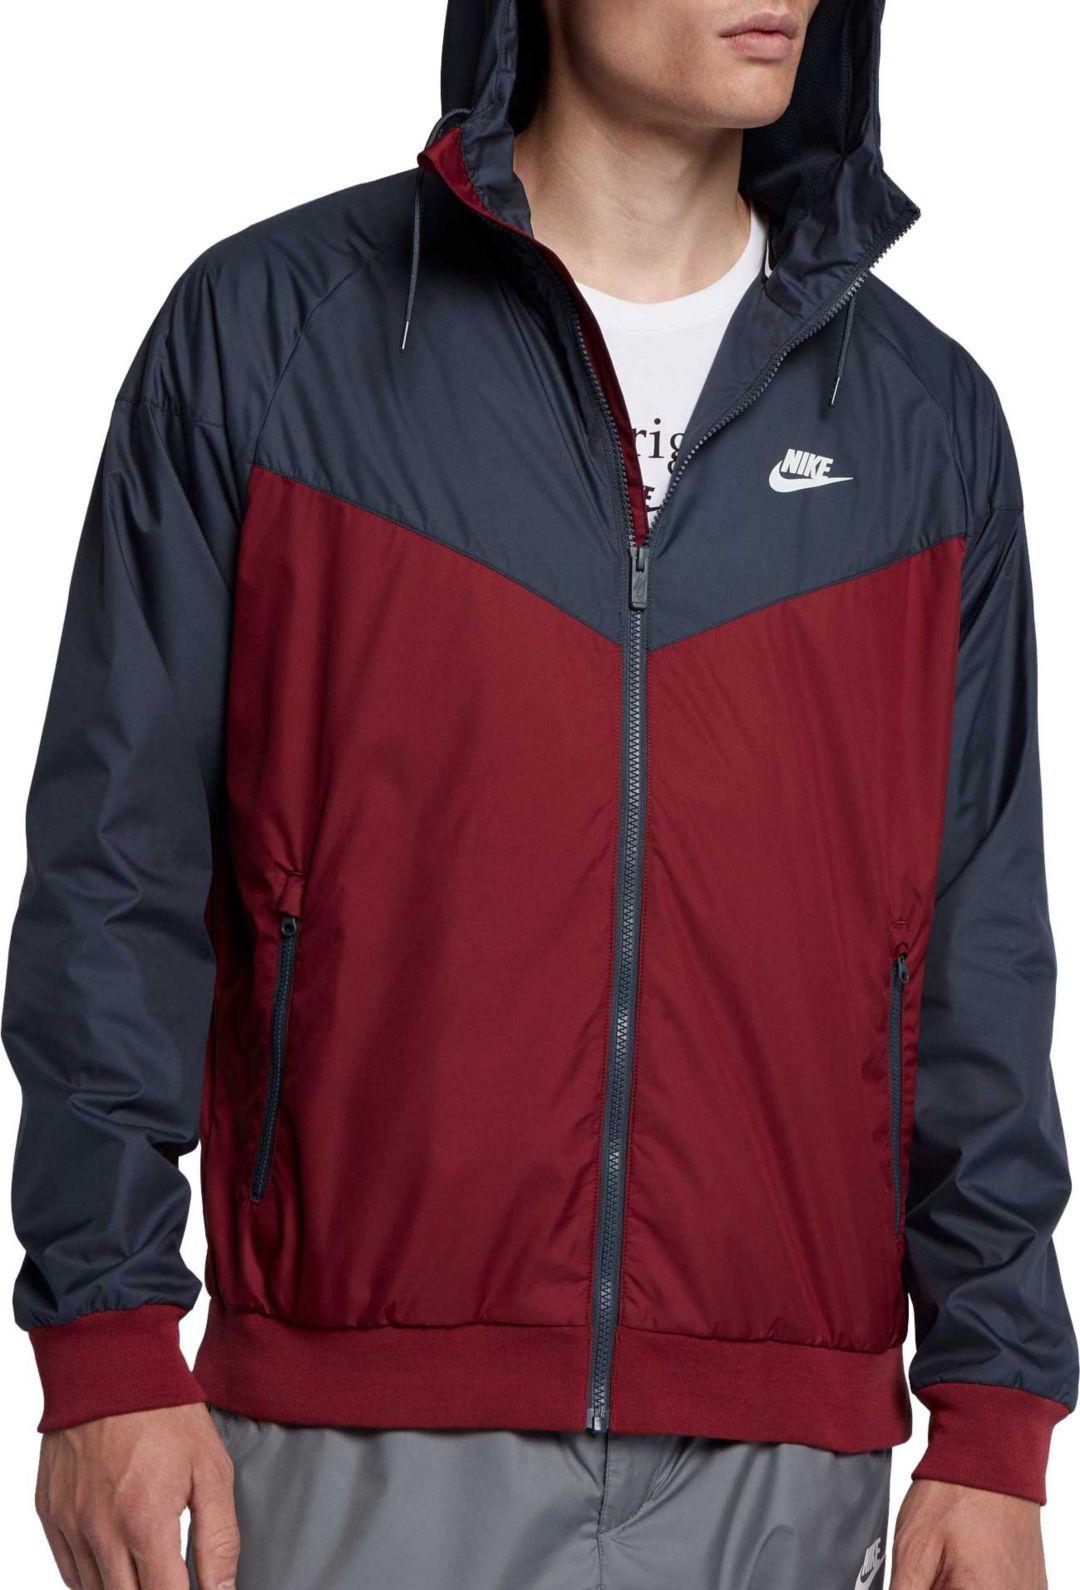 new product 63056 c4210 Nike Men s Windrunner Full Zip Jacket. noImageFound. Previous